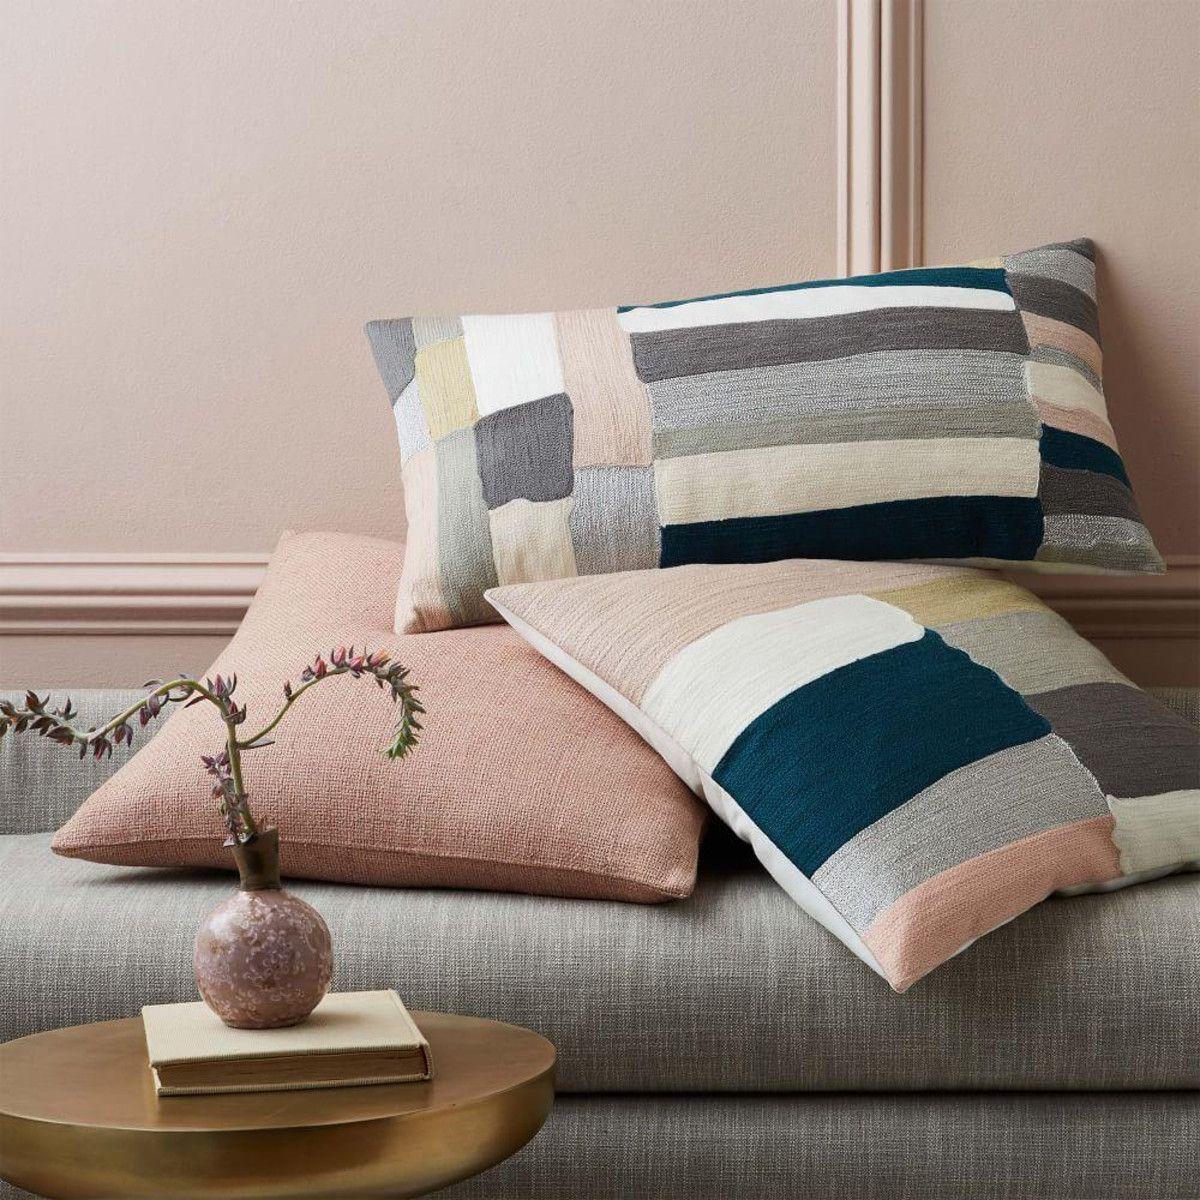 Lark manor paras arm chair amp reviews wayfair ca - Cojines Master Pillows Pillows Amp Pillows West Pillows Throws Amp Throws Throws West Throws Sale Stripes Cushion